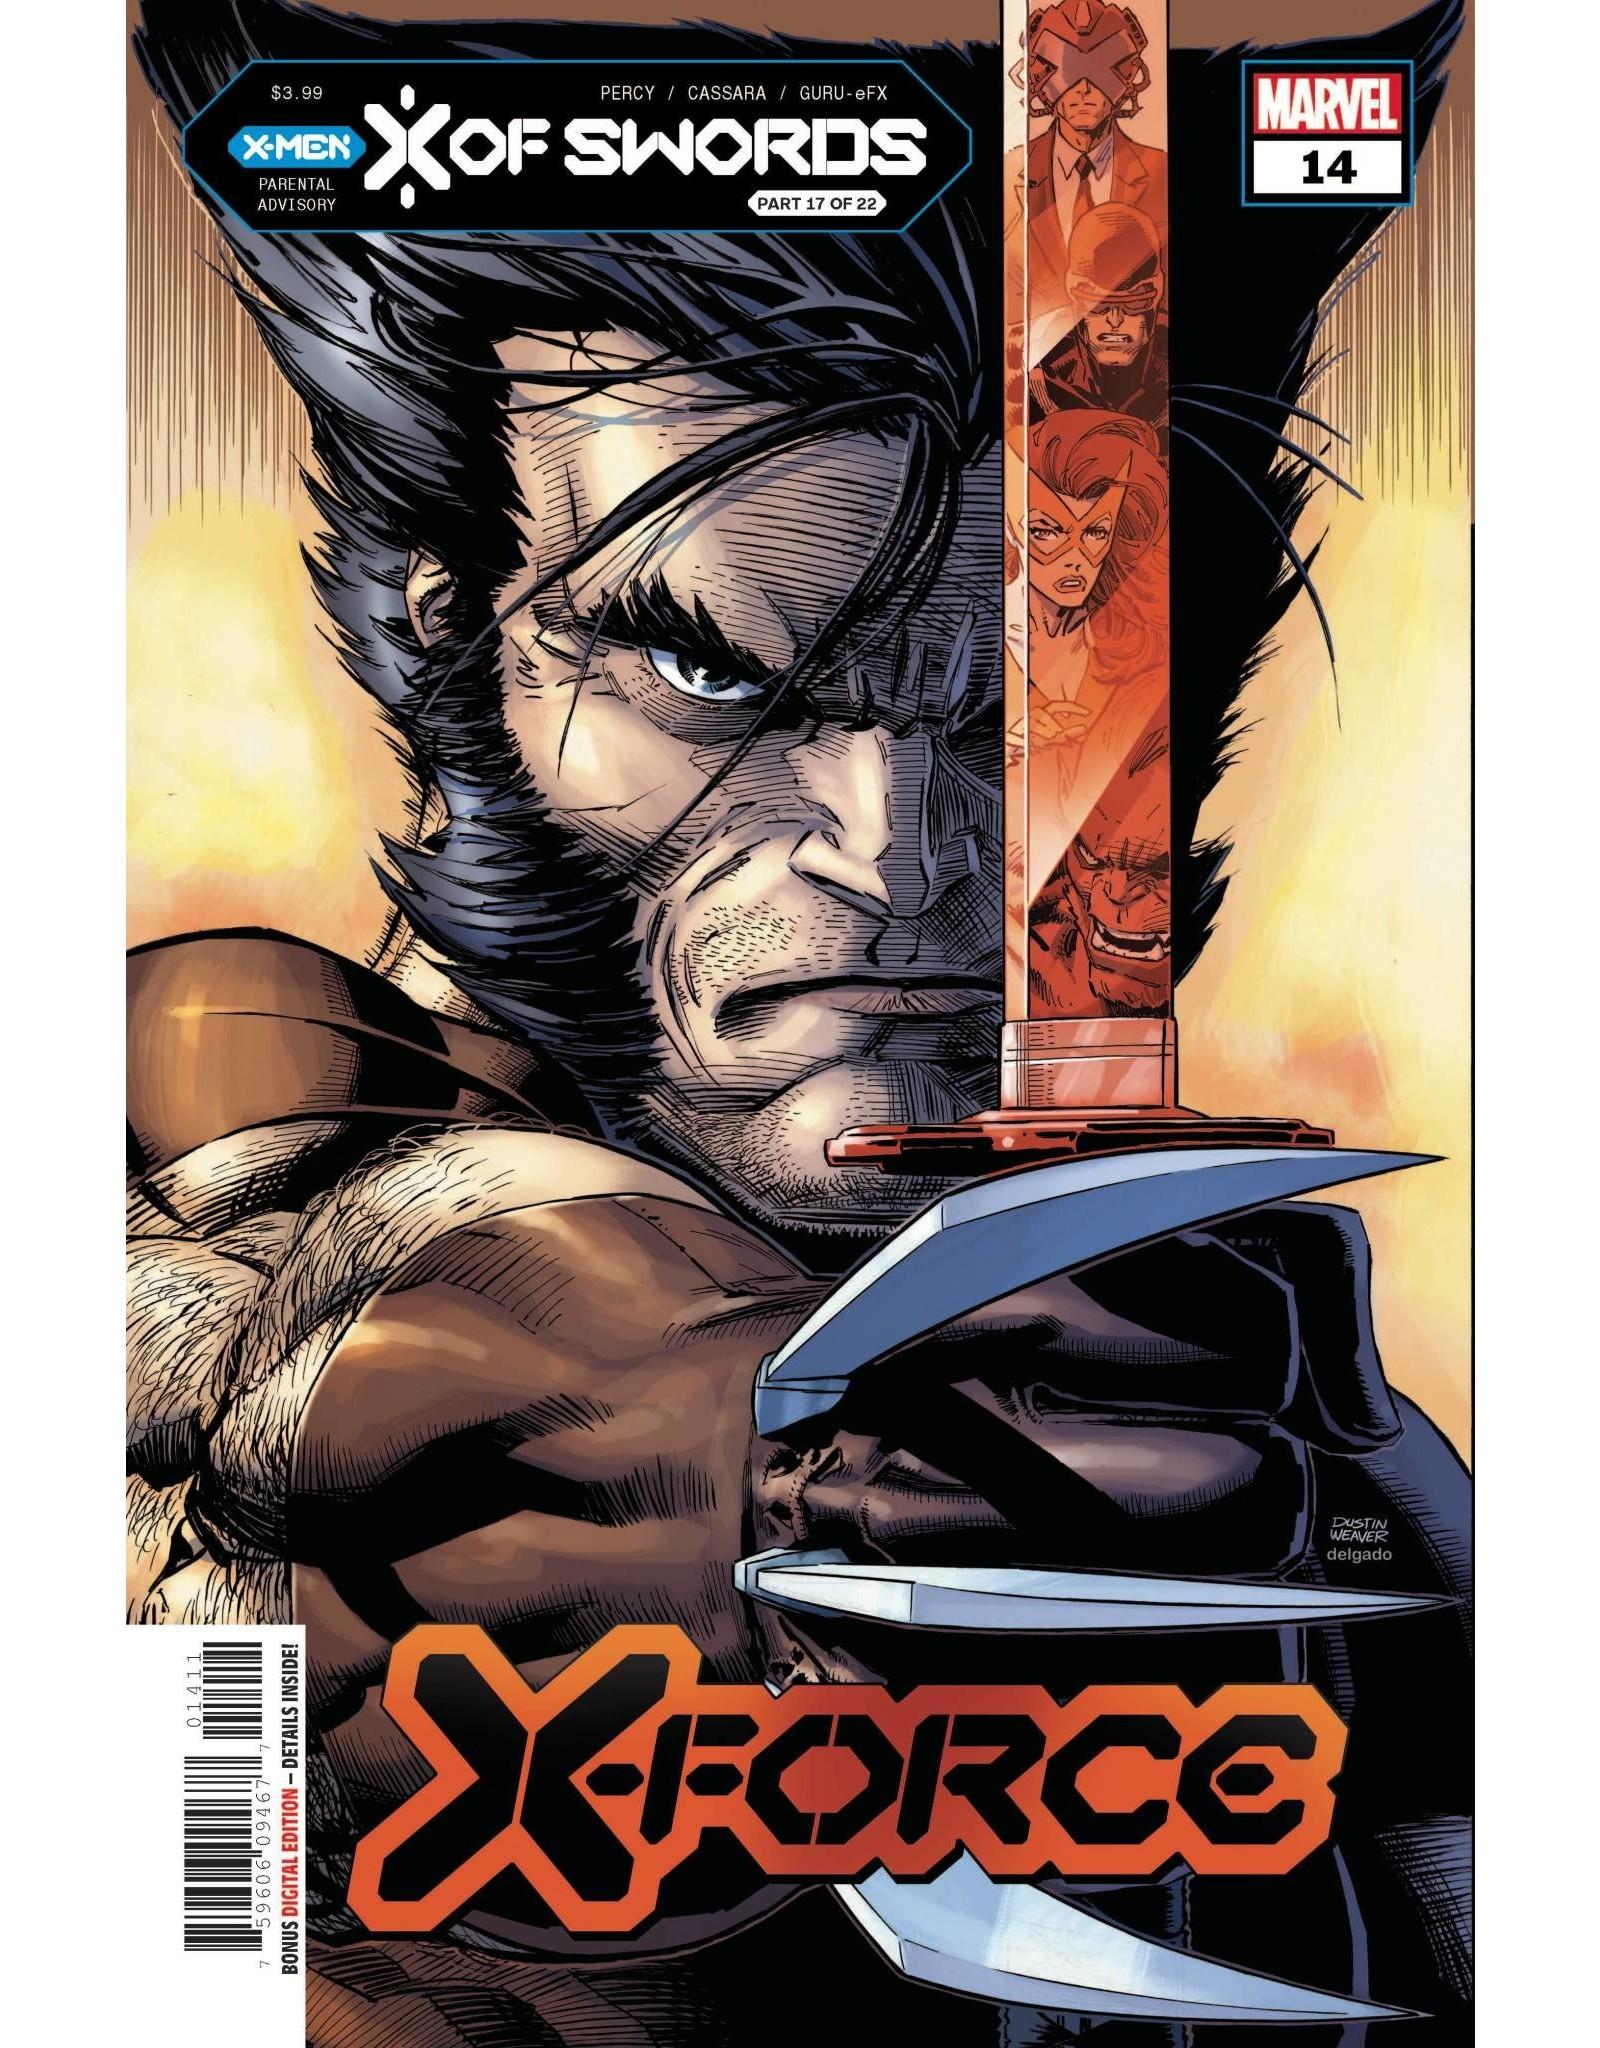 Marvel Comics X-FORCE #14 XOS